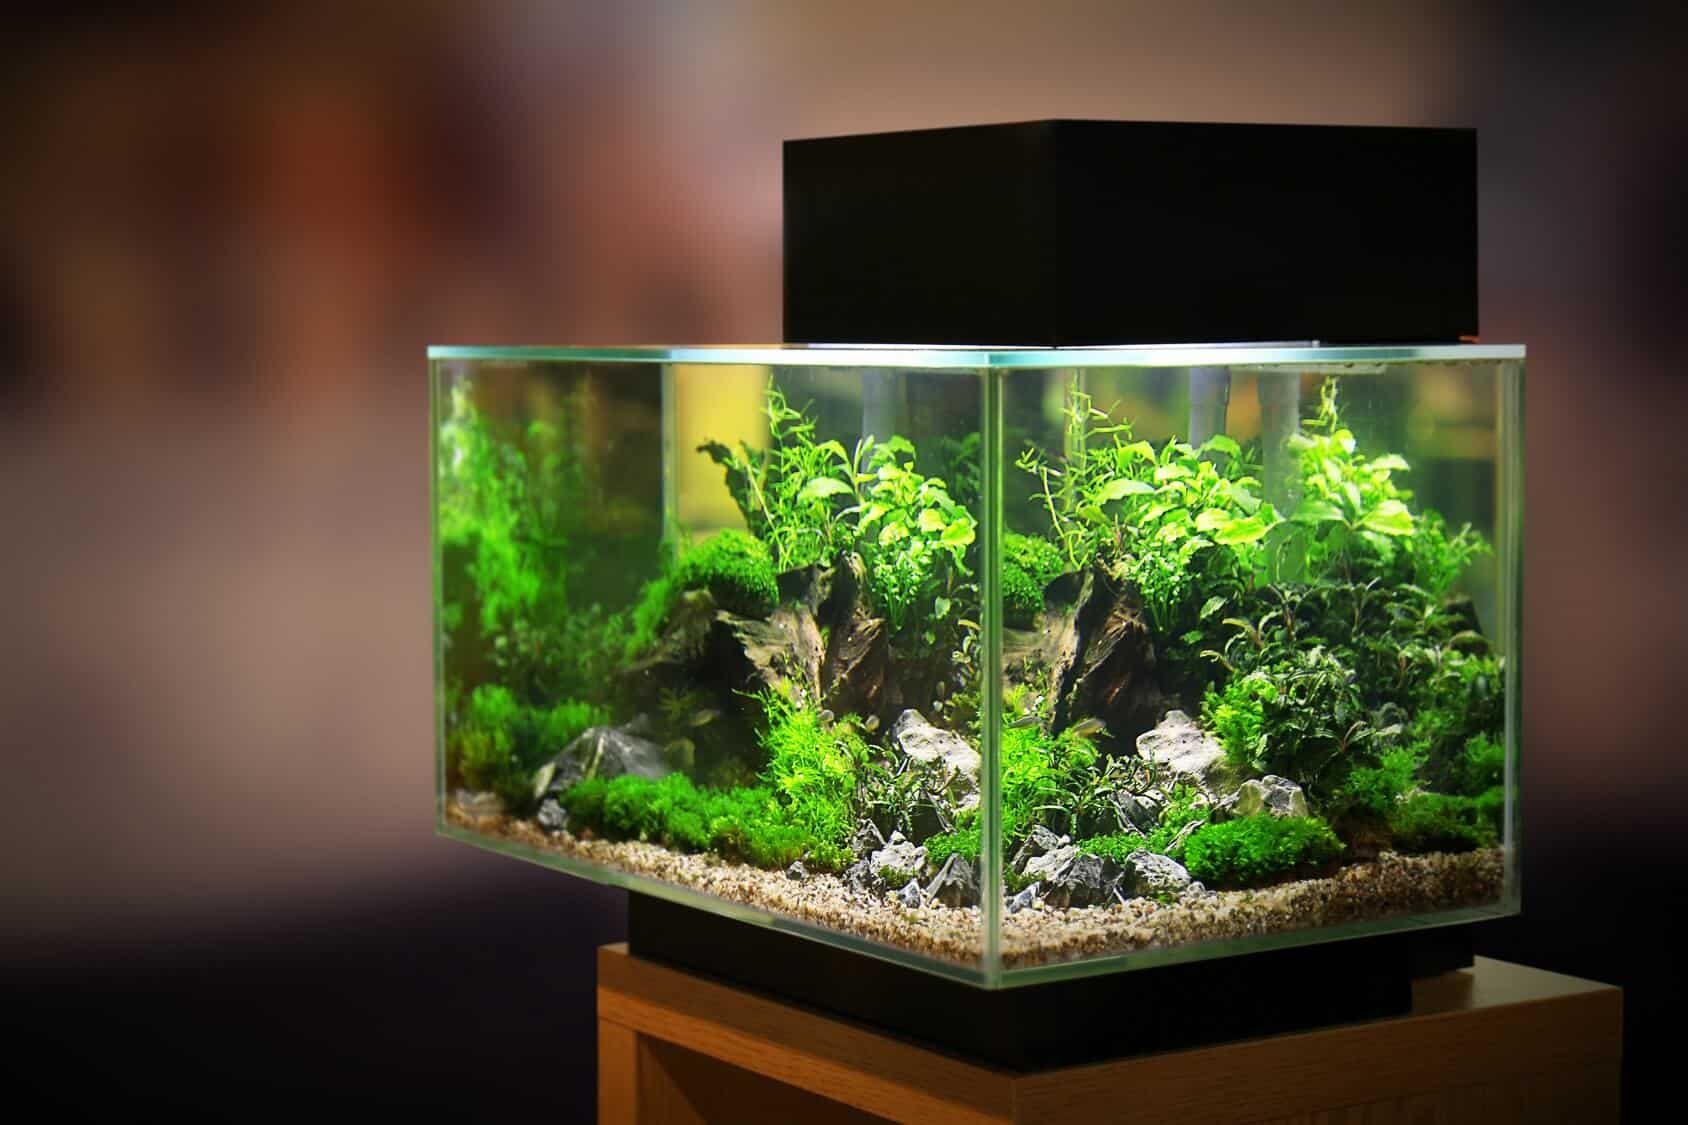 30 Gallon Fish Tank Setups Stocking Ideas Equipment And More Fishkeeping World